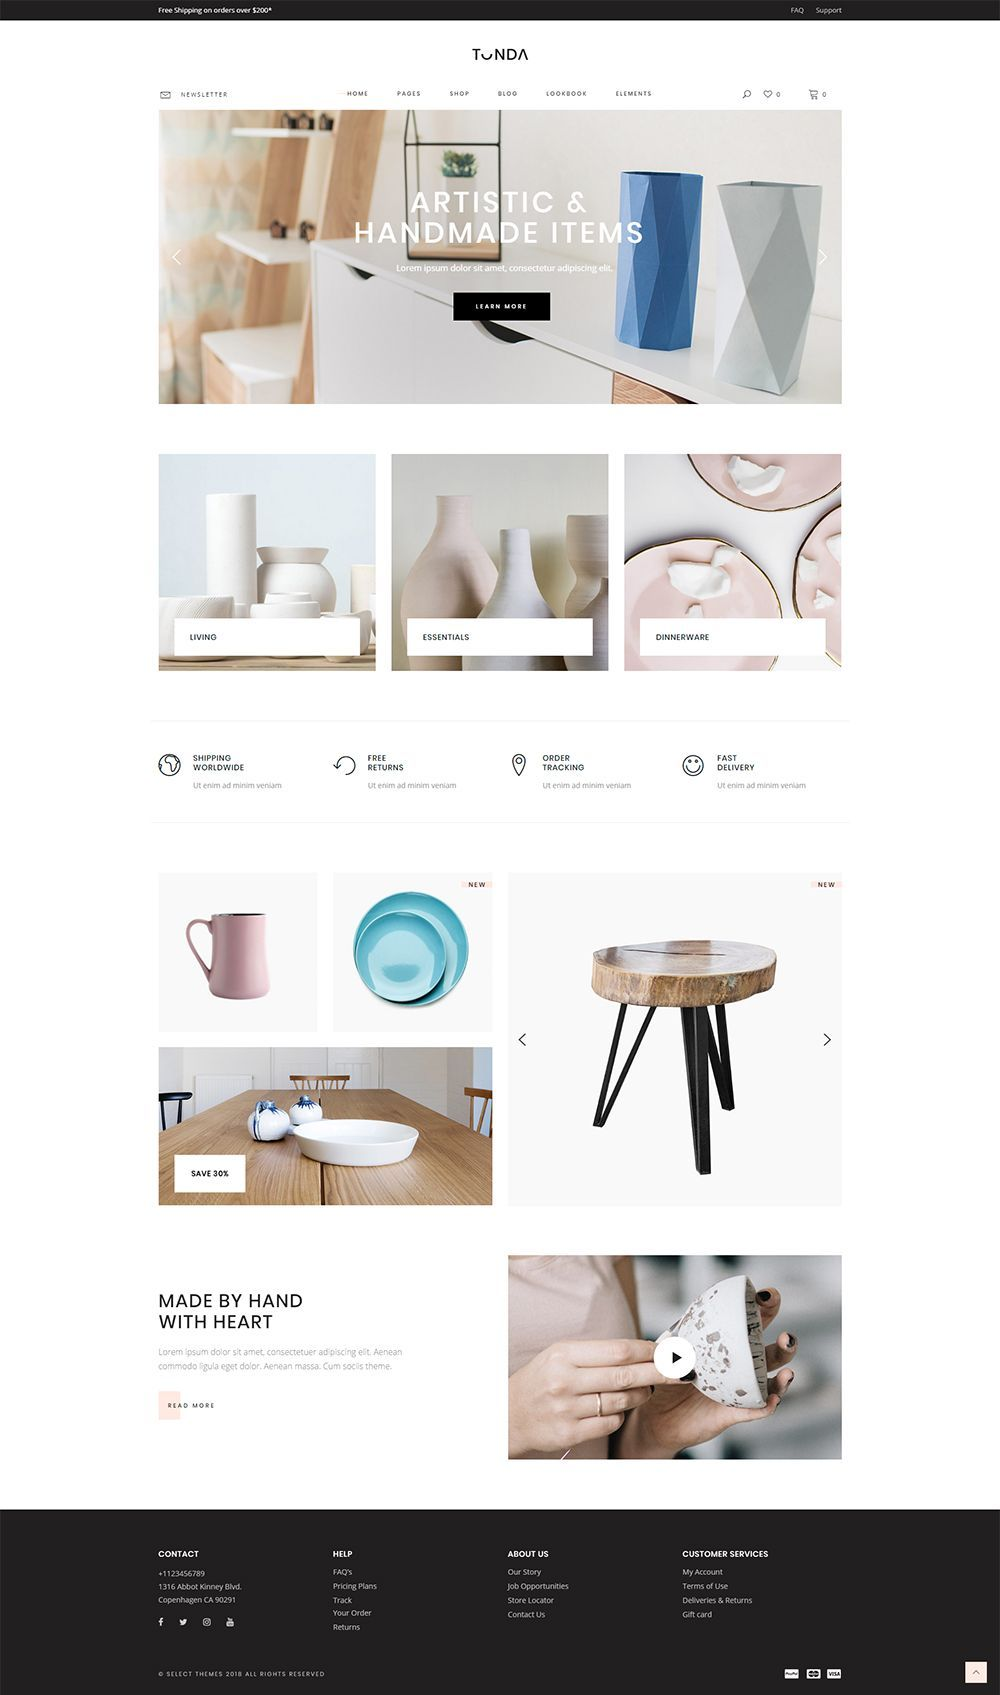 Tonda Elegant Shop Theme In 2020 Latest Web Design Trends Web Design Trends Woocommerce Themes